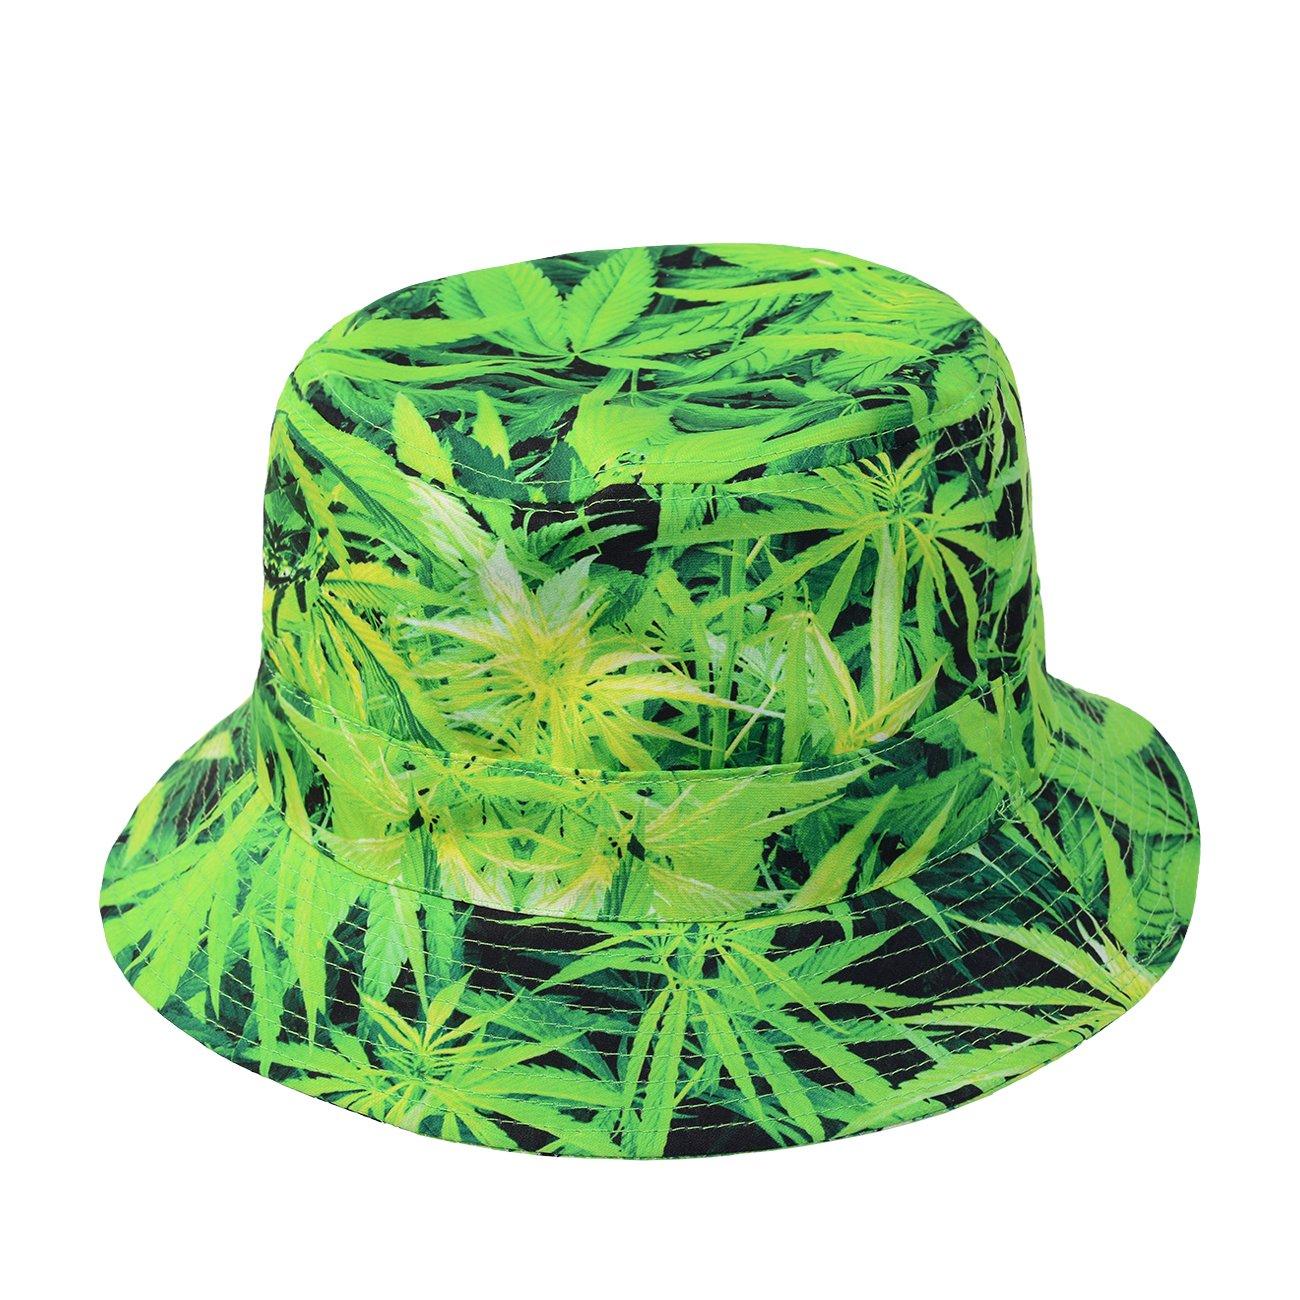 the Marijuana Bucket Hat